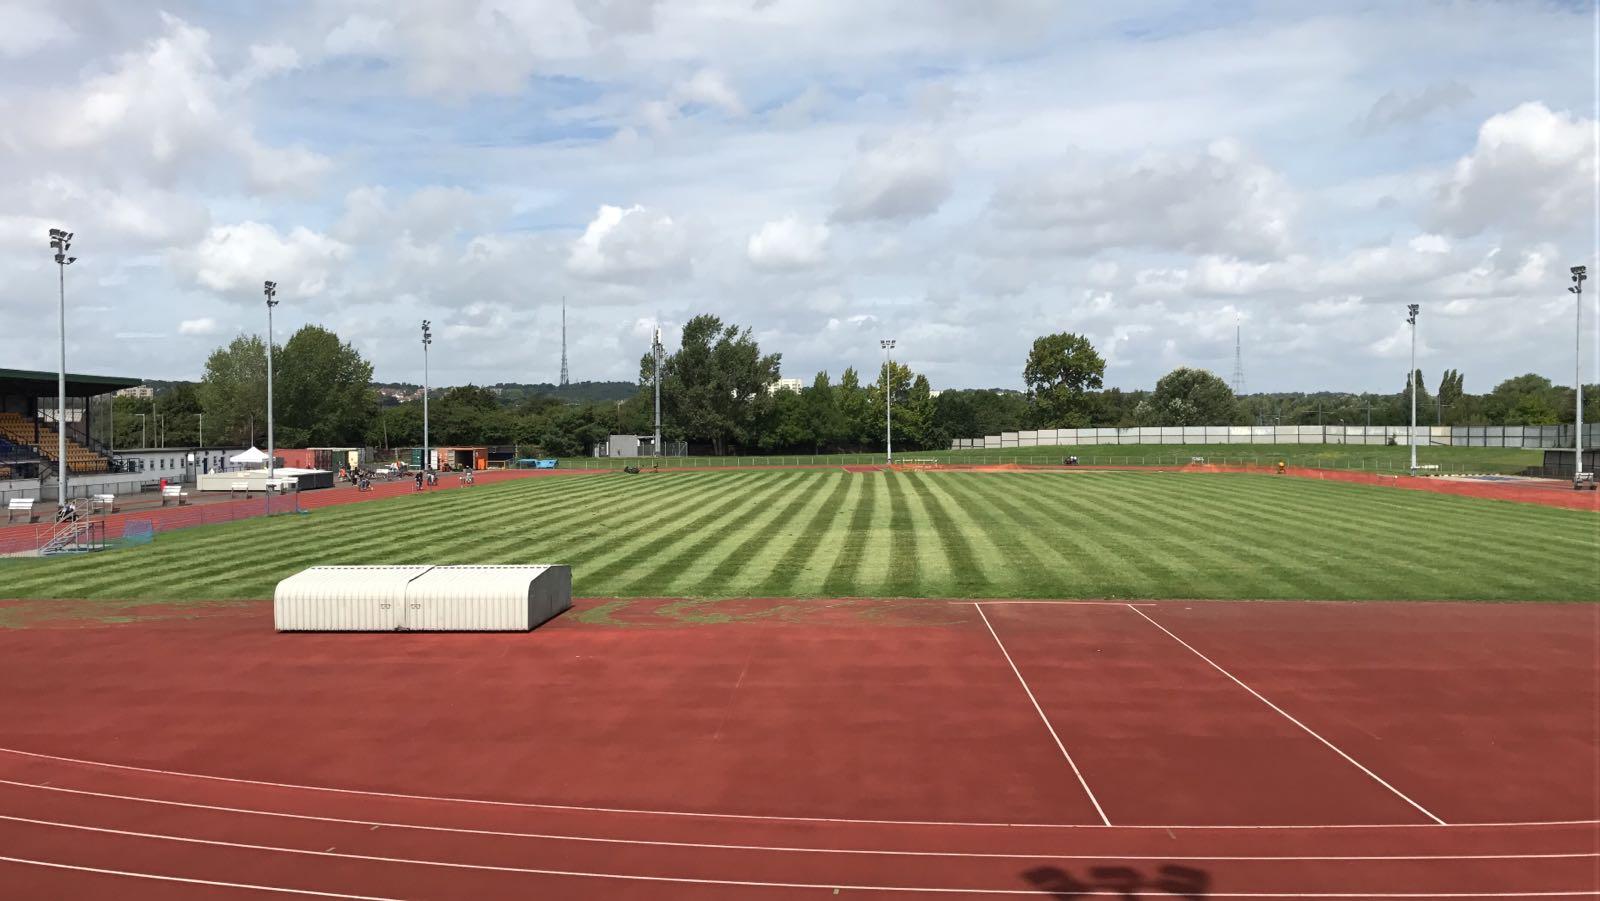 Barnet FC Visit Croydon Arena for Pre-Season Friendly